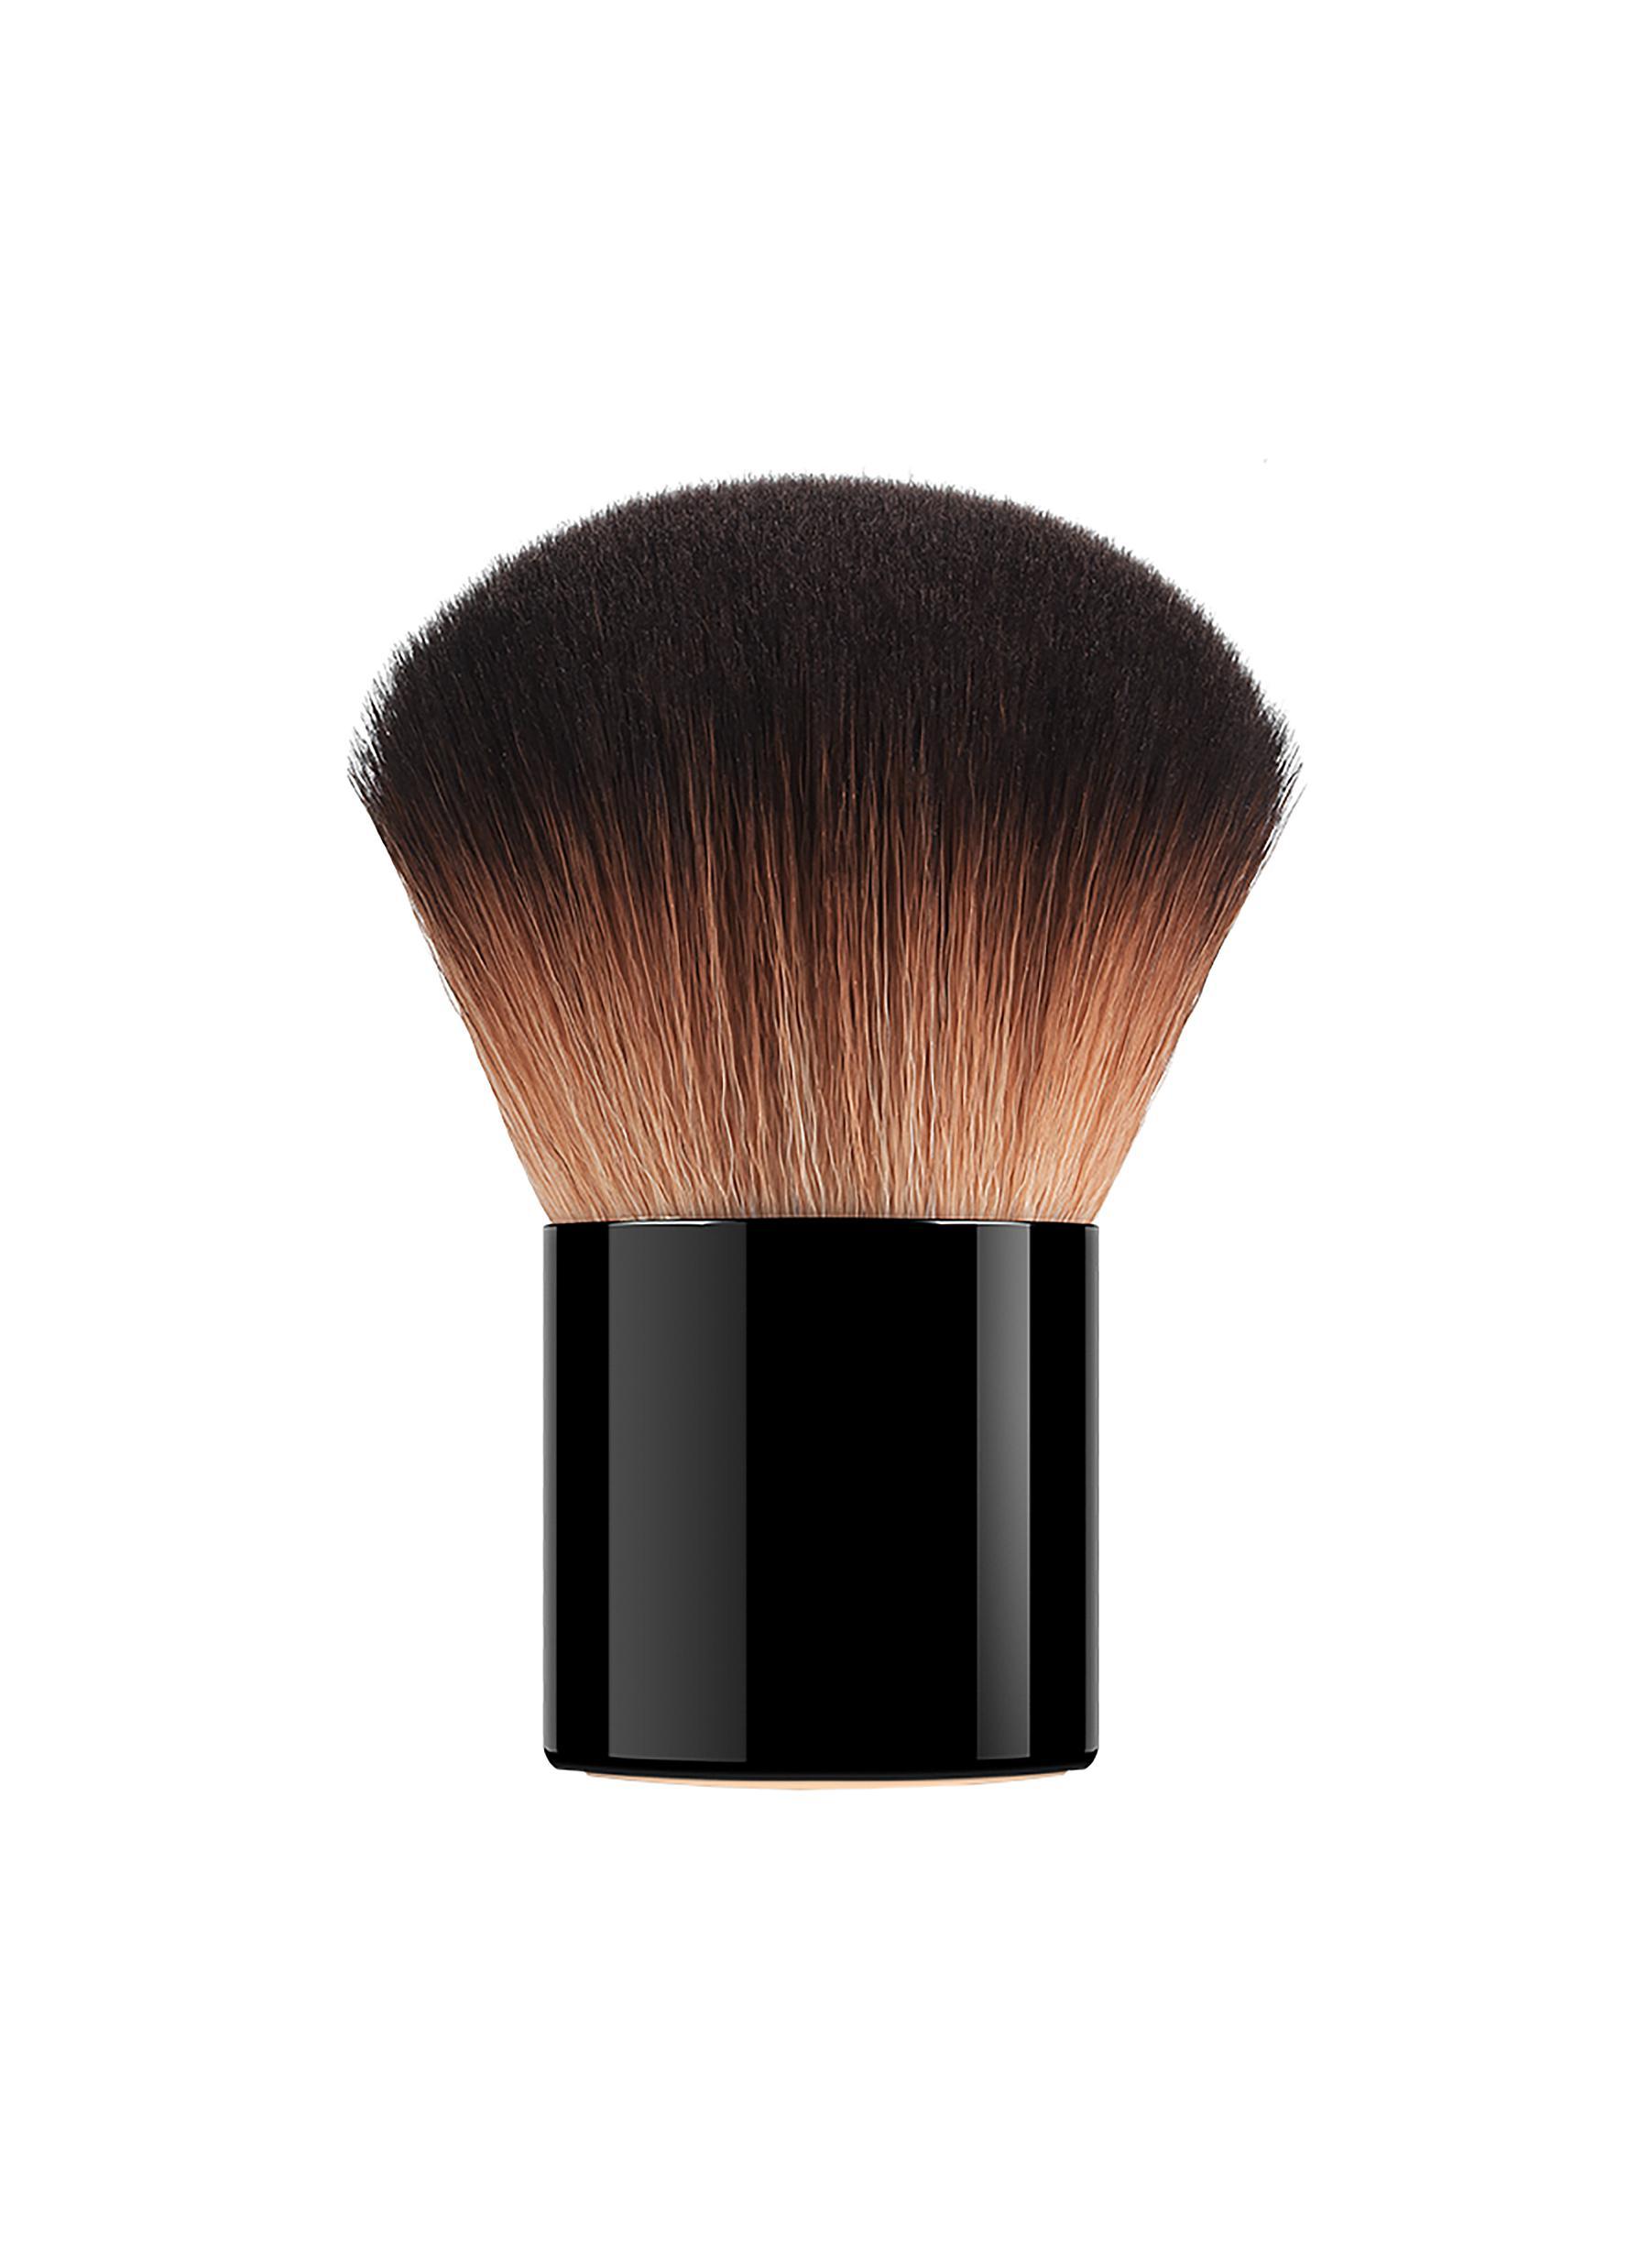 Giorgio Armani Beauty Neo Nude Kabuki Brush Beauty Lane Crawford -> Aki Carpetes